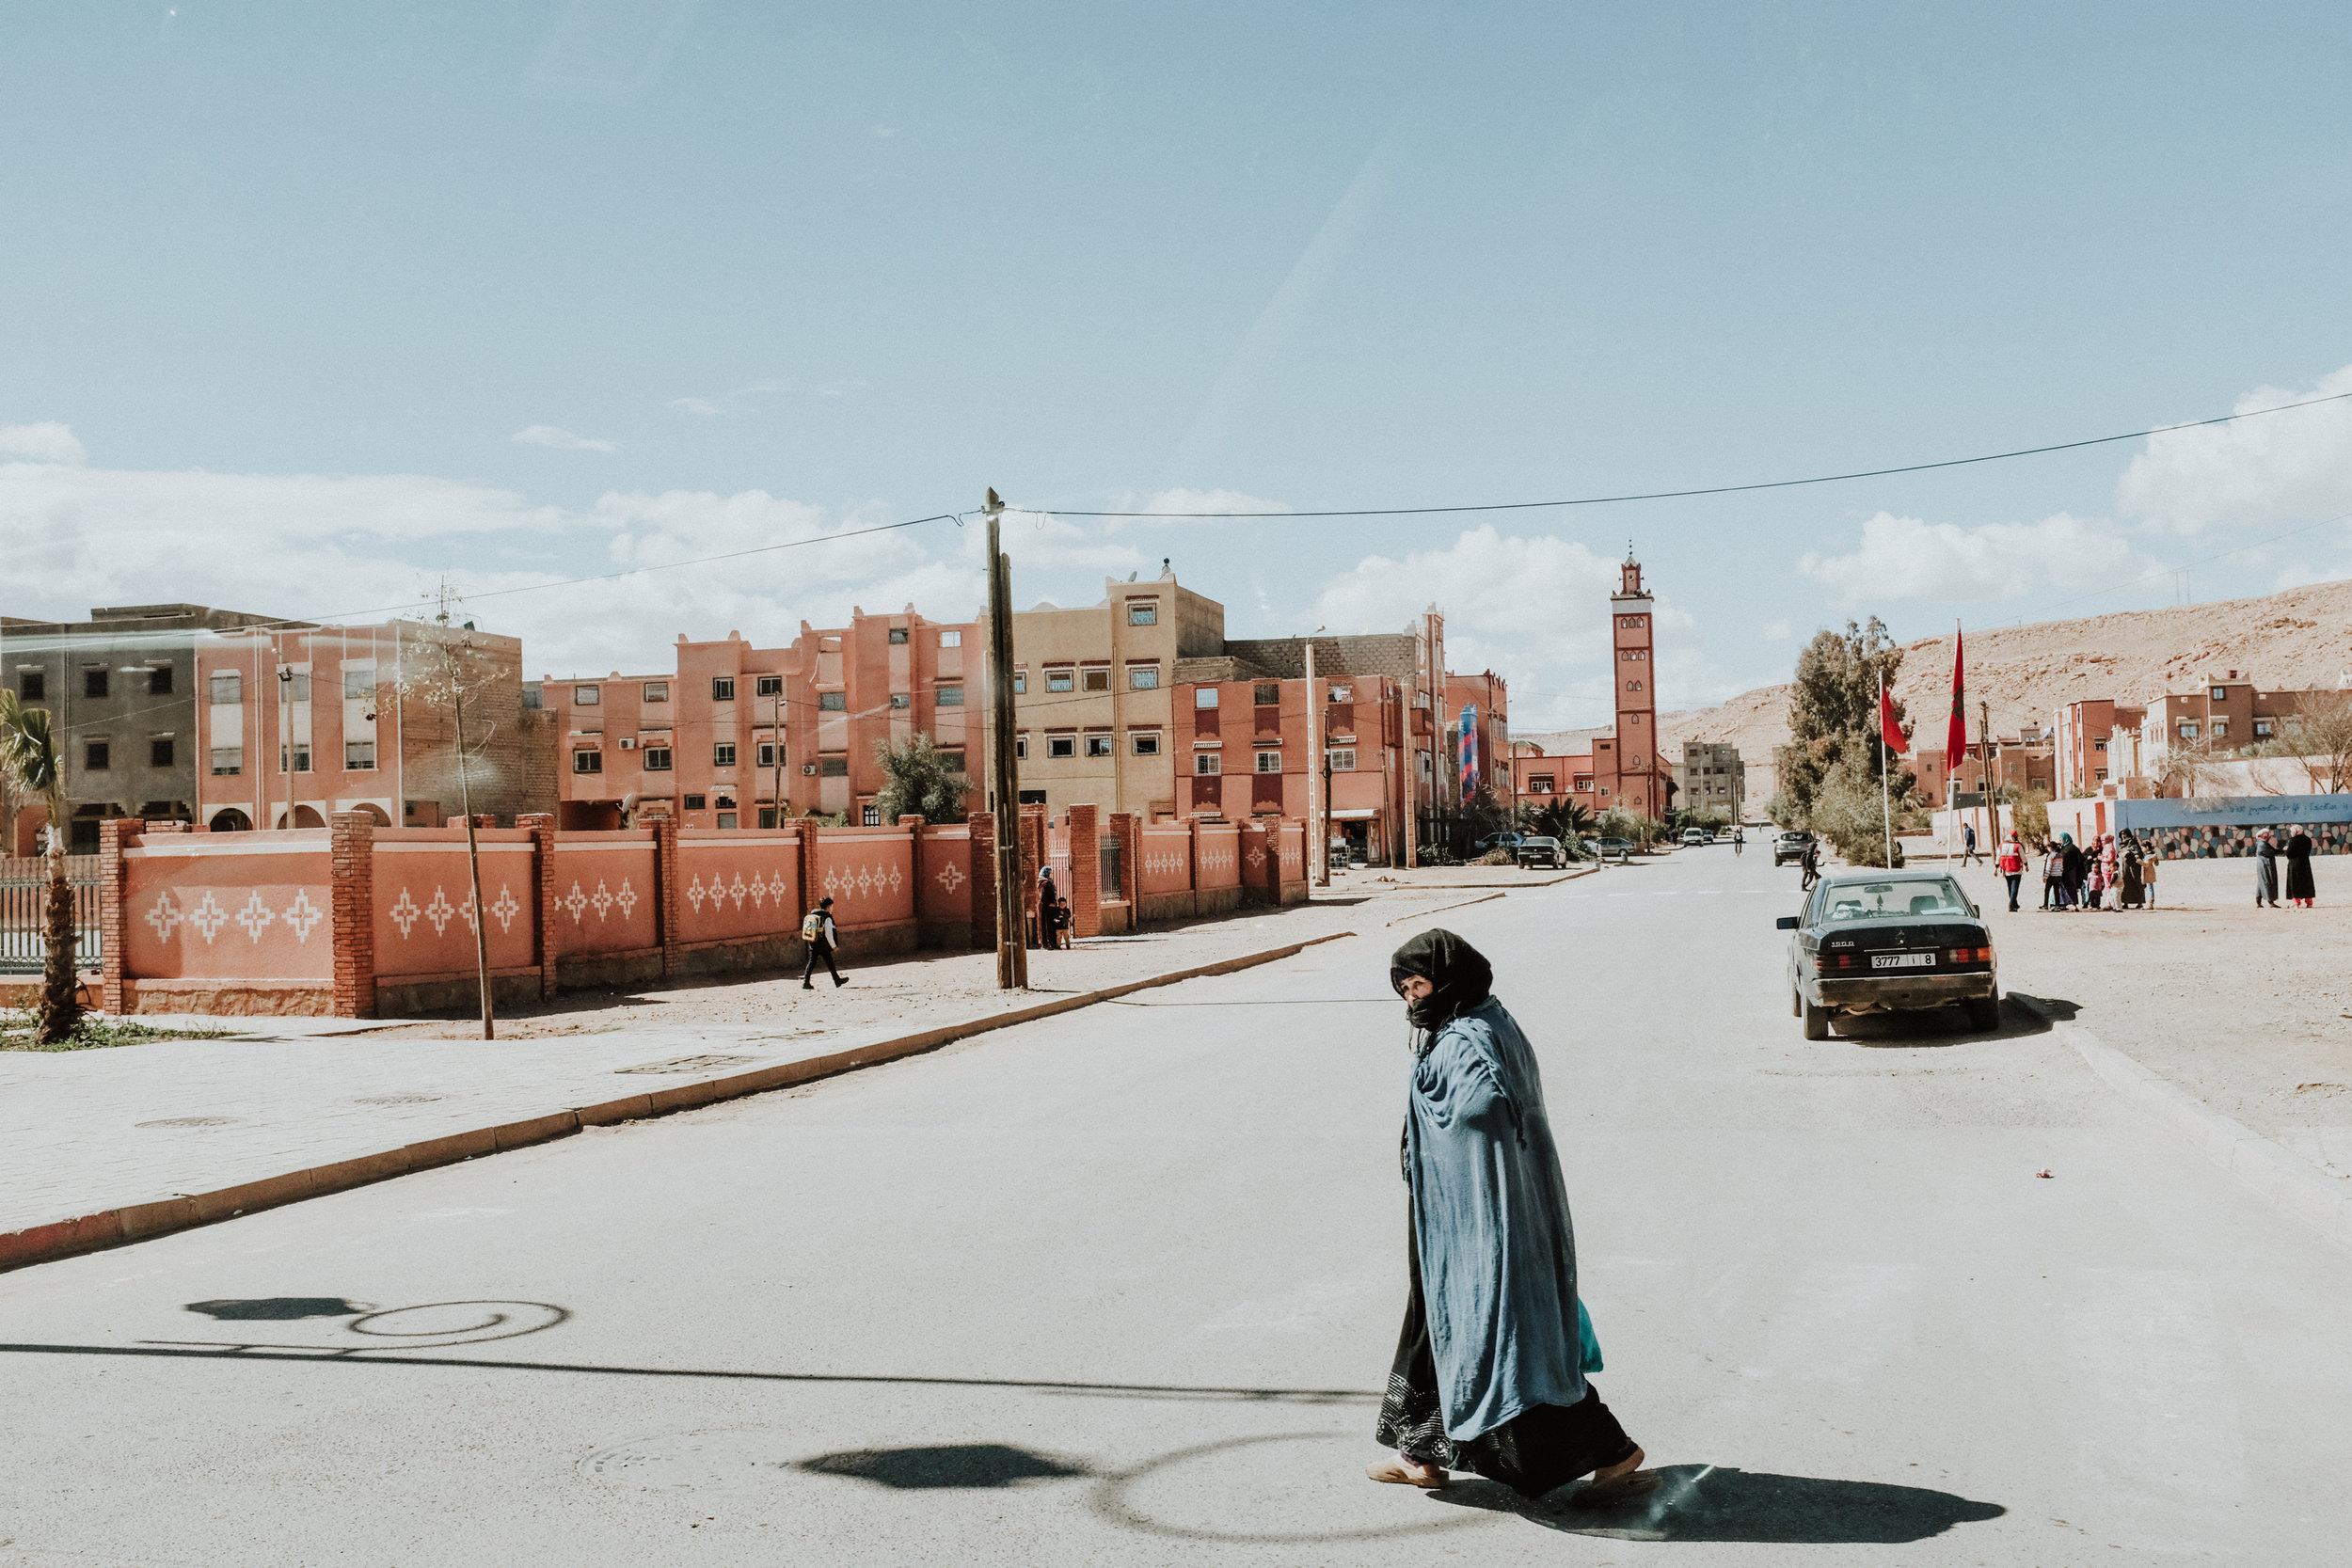 fuji x100f, fuji photographer, morocco street photography